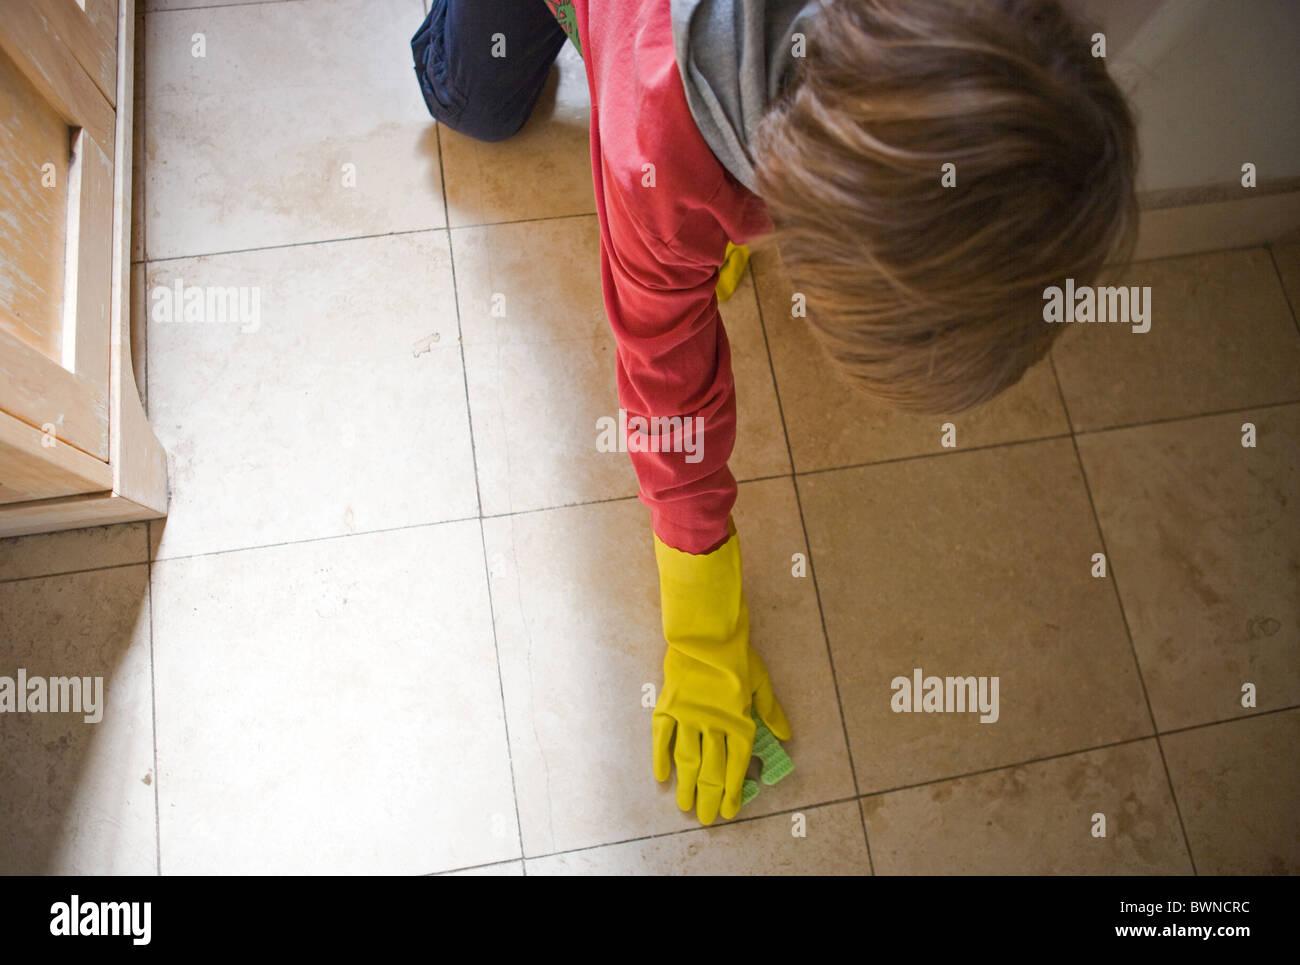 Cleaning Bathroom Floor Stock Photos & Cleaning Bathroom